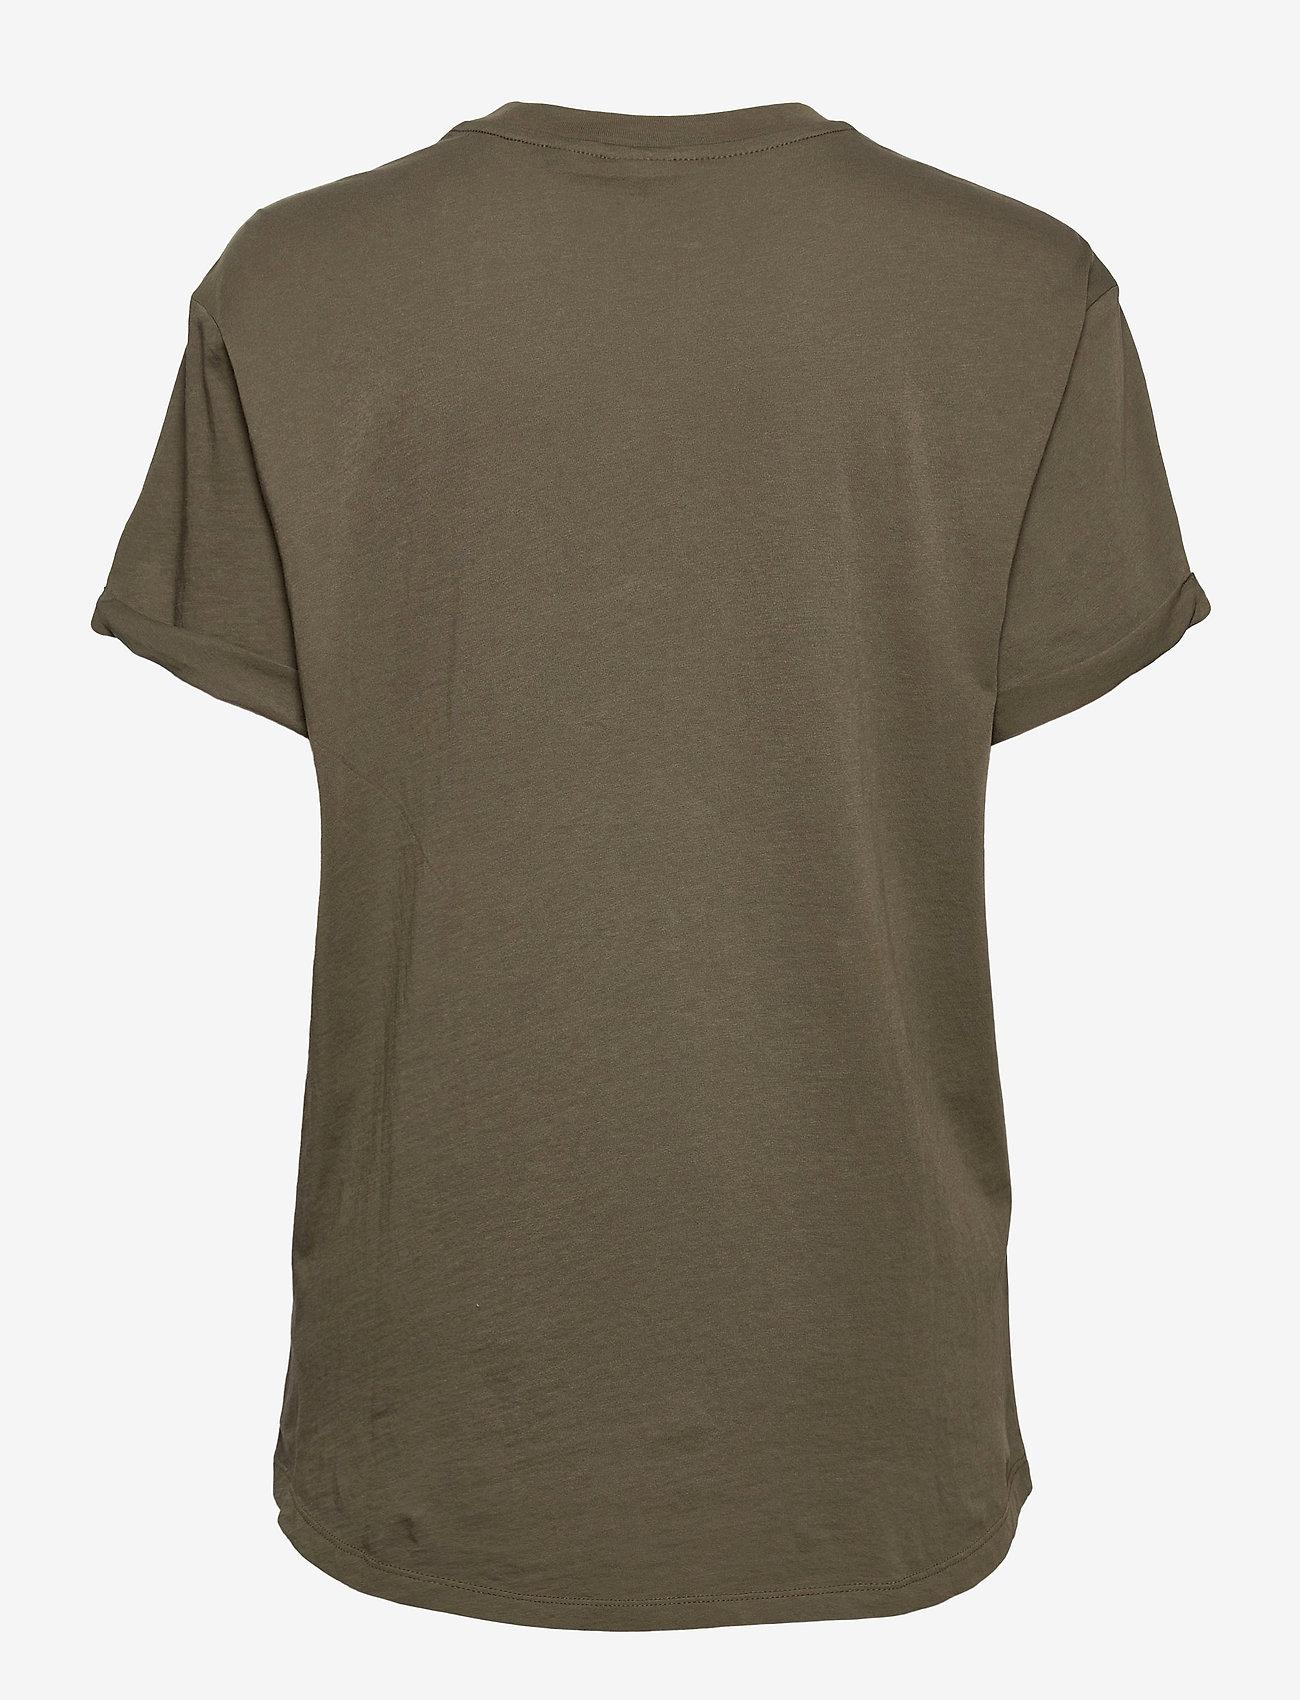 G-star RAW - Lash fem loose r t wmn s\s - t-shirts - combat - 1